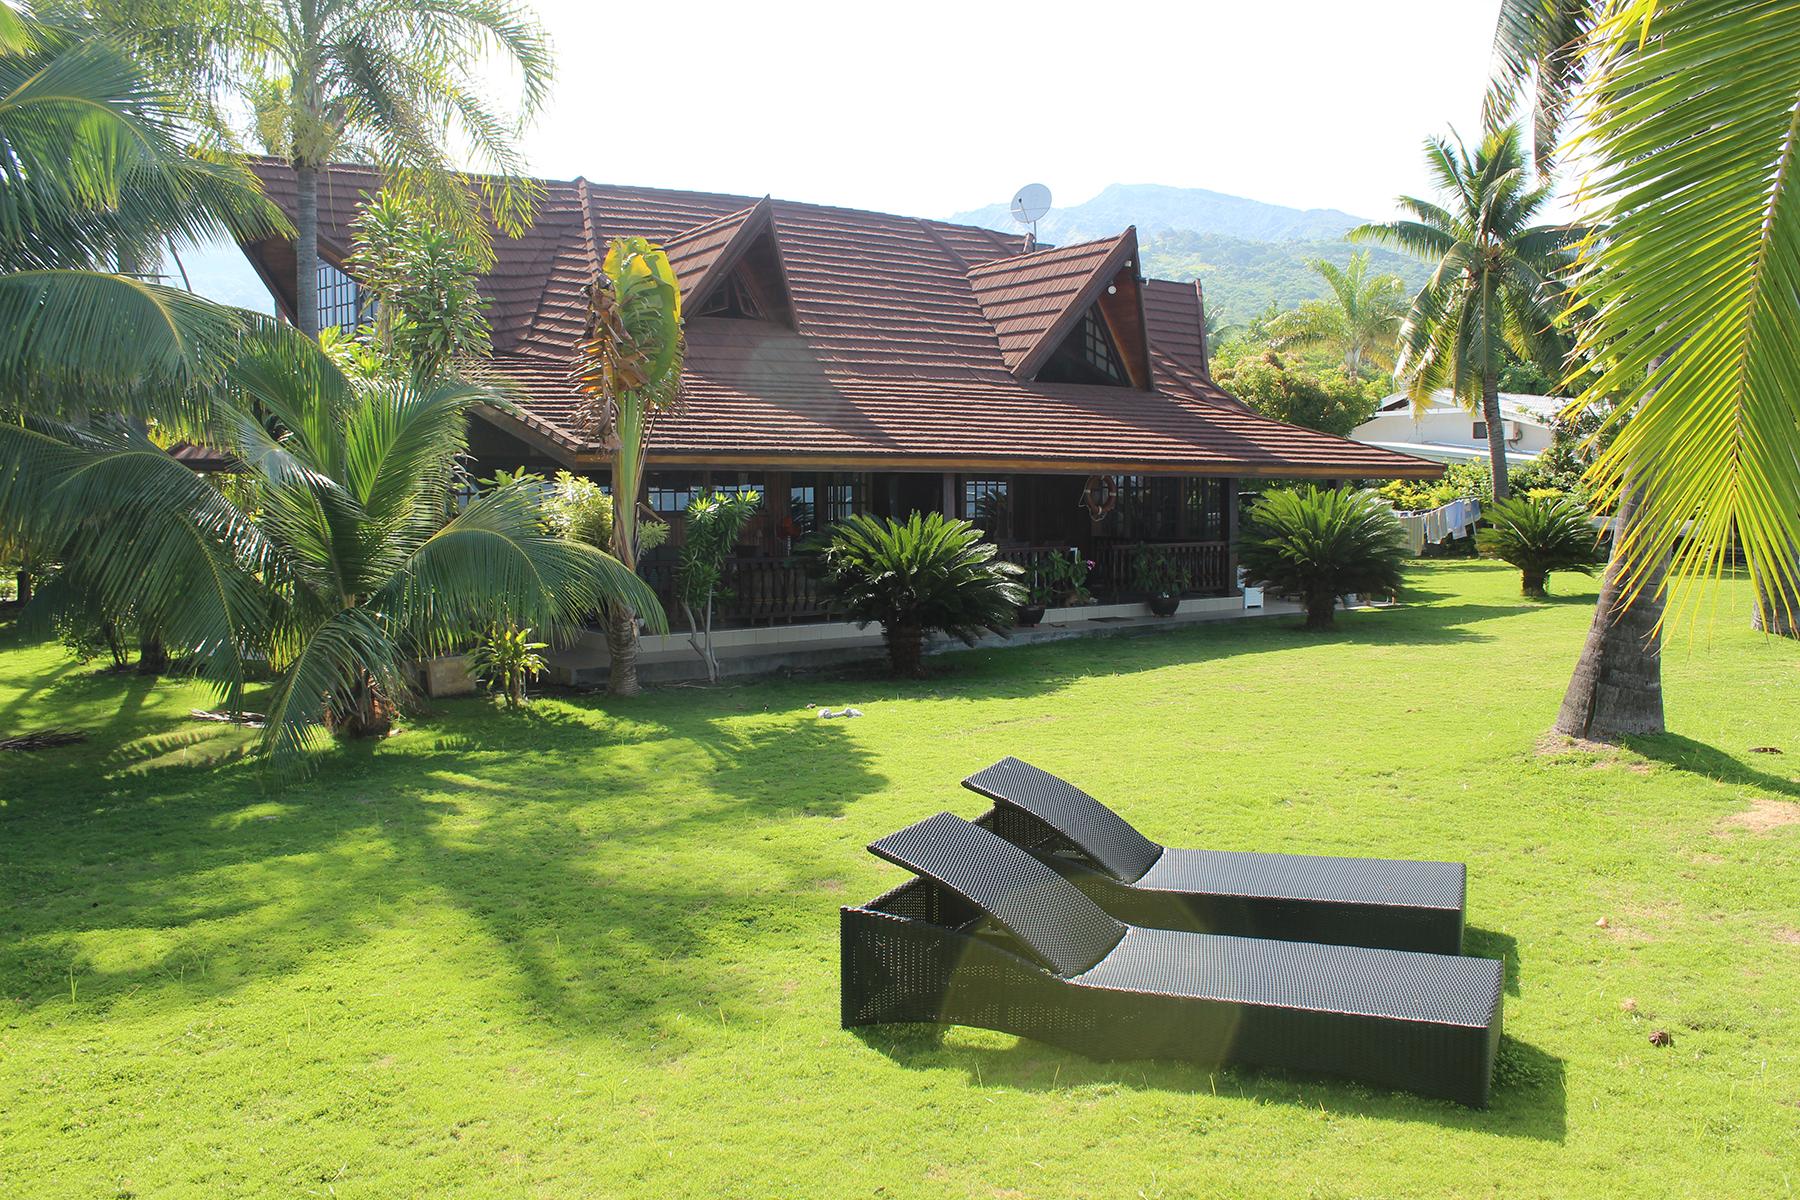 Casa Unifamiliar por un Venta en luxurious property in front of the lagoon Tahiti, 98718 French Polynesia